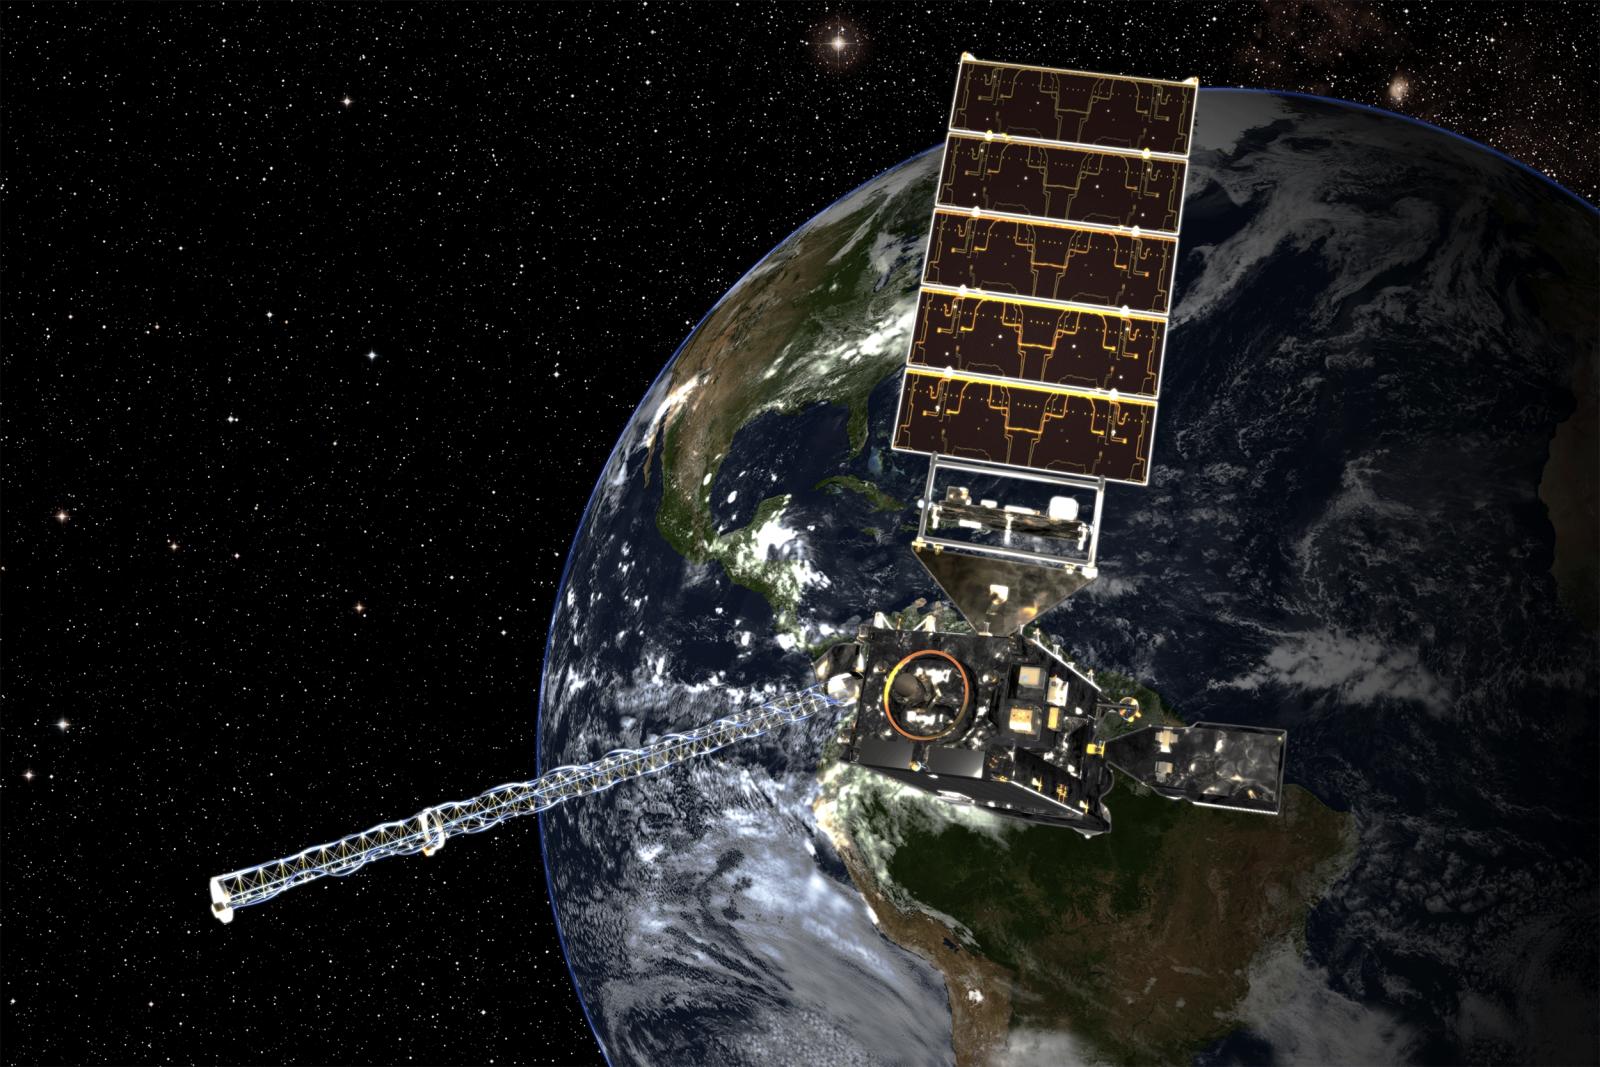 Satellites Satellite Orbits Map Us on satellite moon map, satellite global map, satellite gps software map, satellite constellation map, geosynchronous satellite location map, space satellite map, satellite galaxy map, satellite sky map, satellite gravity map, satellite map of earth, satellite clip art, orbital launch satellite map, satellite terra map,